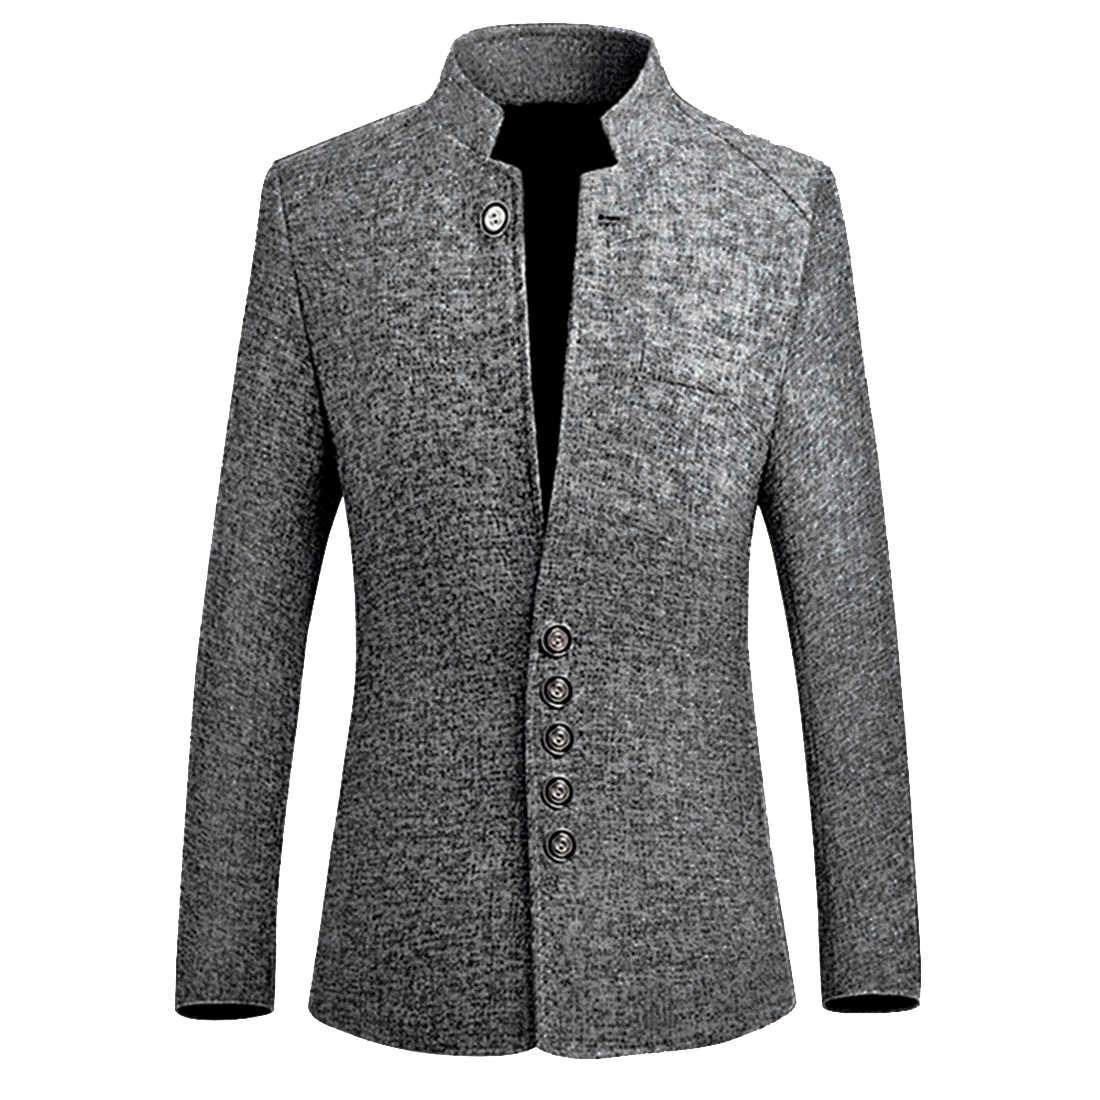 Heflashorブレザー男性ホット販売秋中国風のカジュアルなスーツ大サイズ男性春のファッションスーツ高品質M-5XL